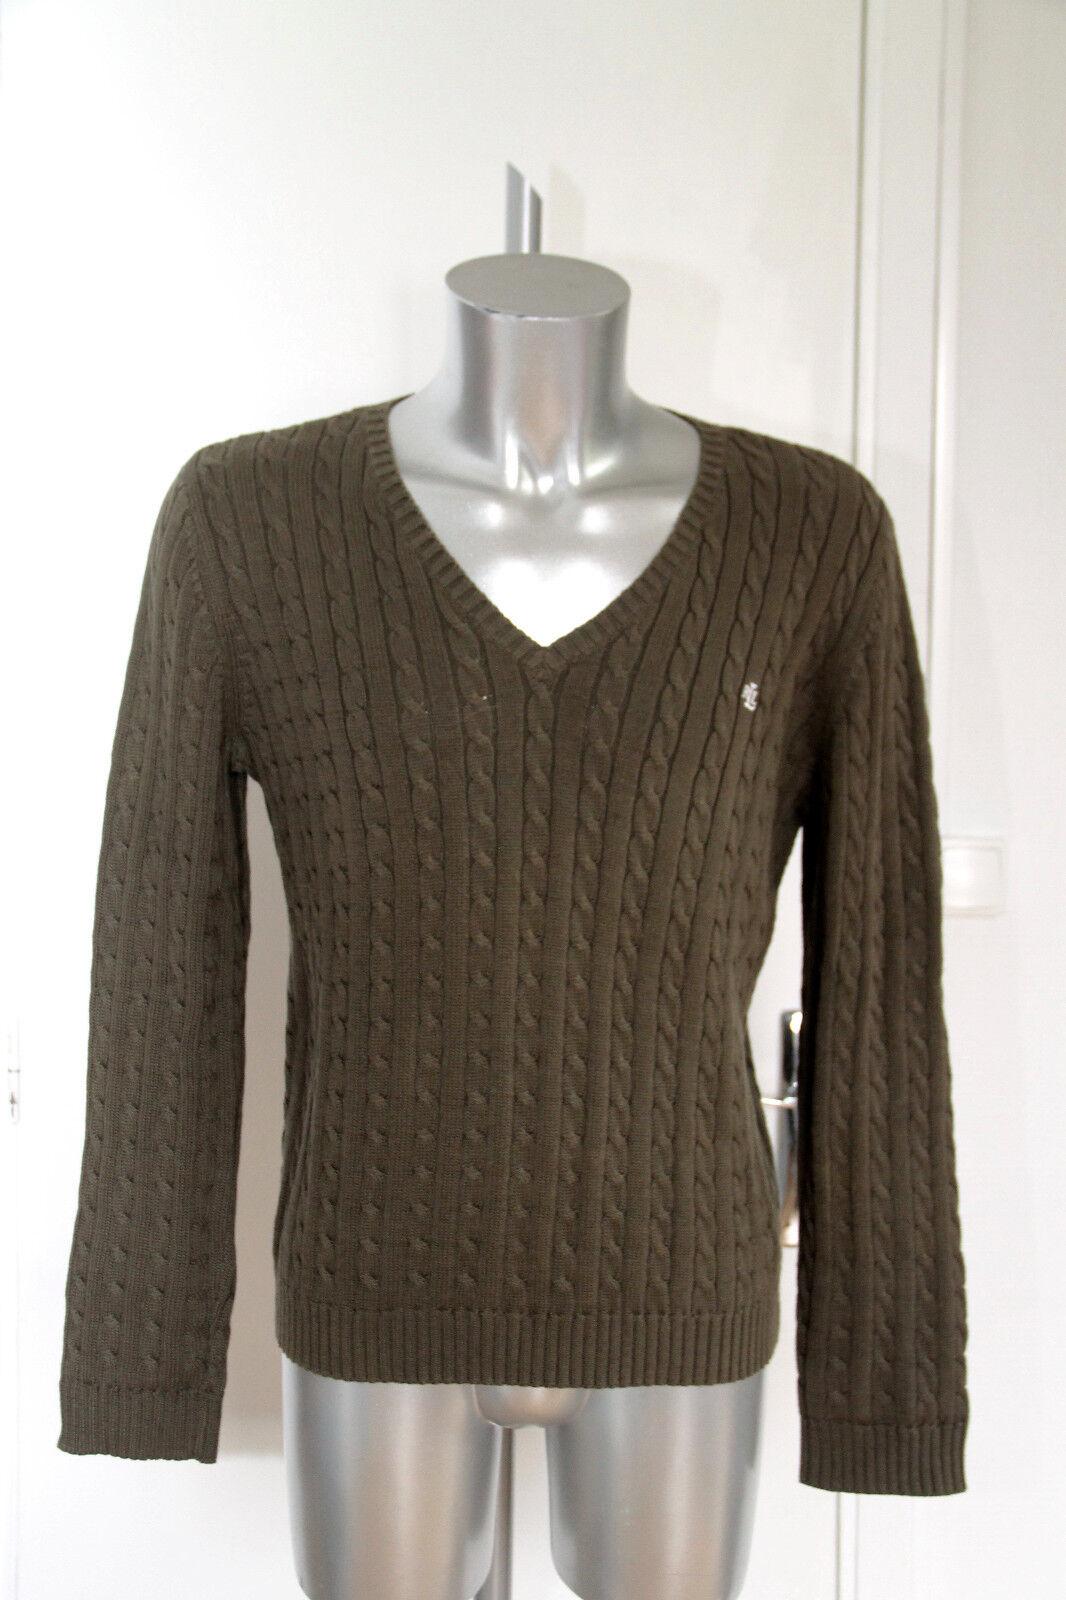 Bonito suéter de hombre algodón caqui green label RALPH LAUREN size XL